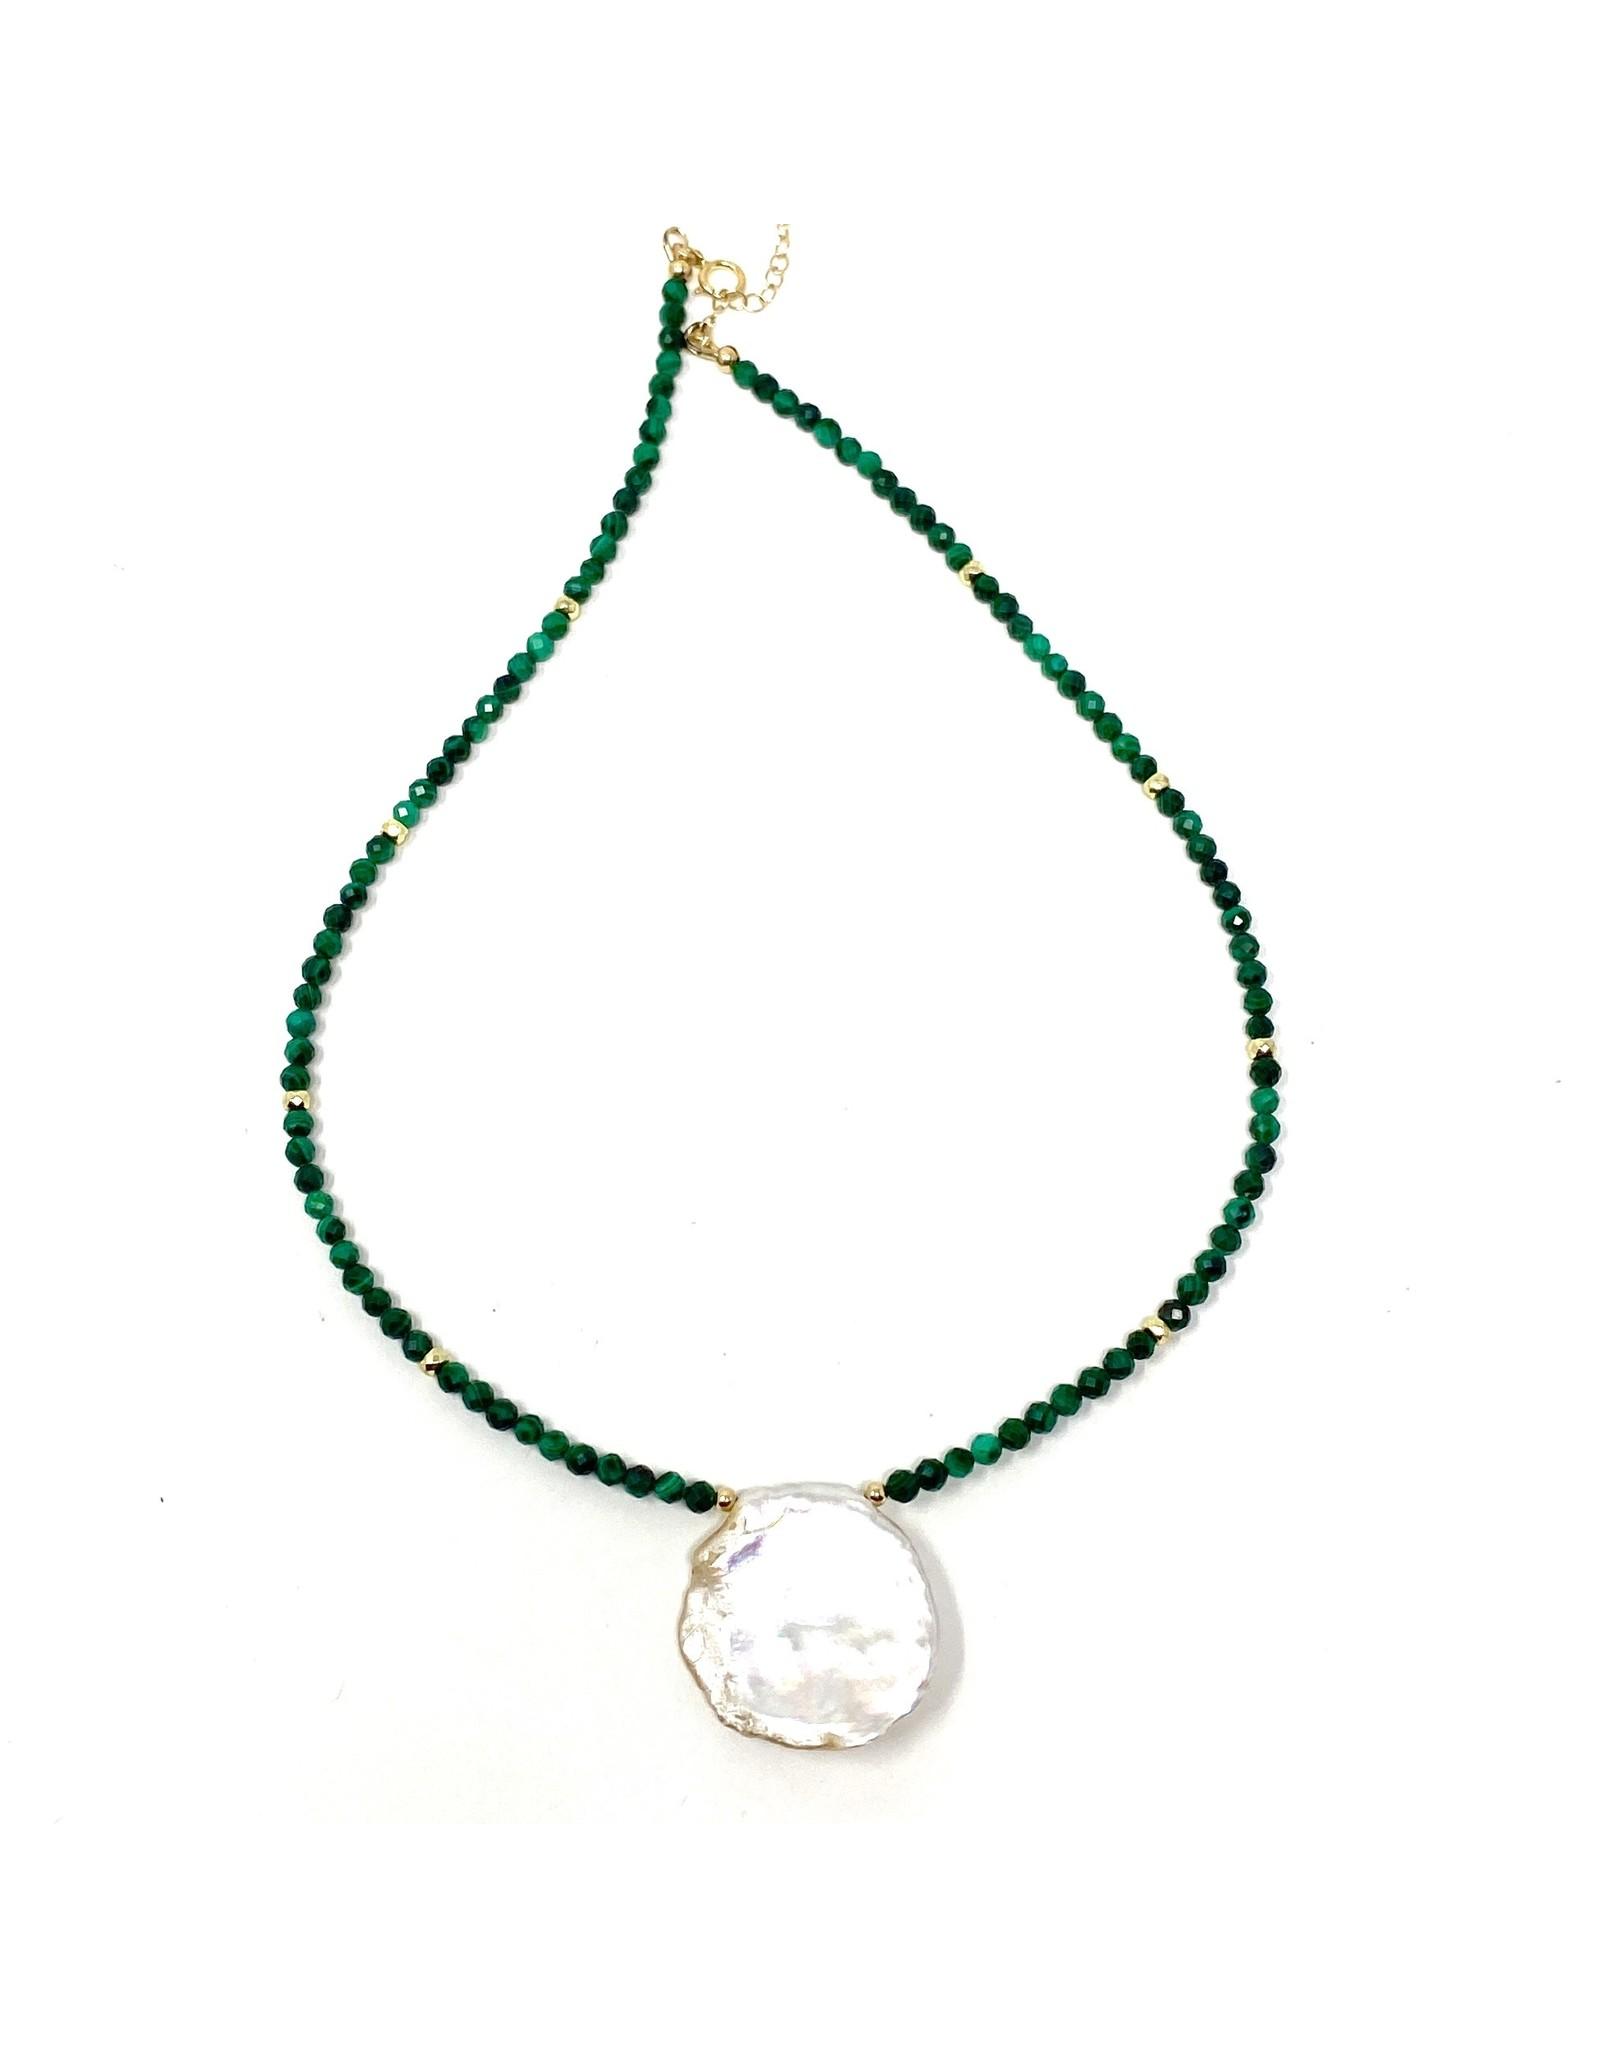 Round Keshi Pearl & Malachite Necklace